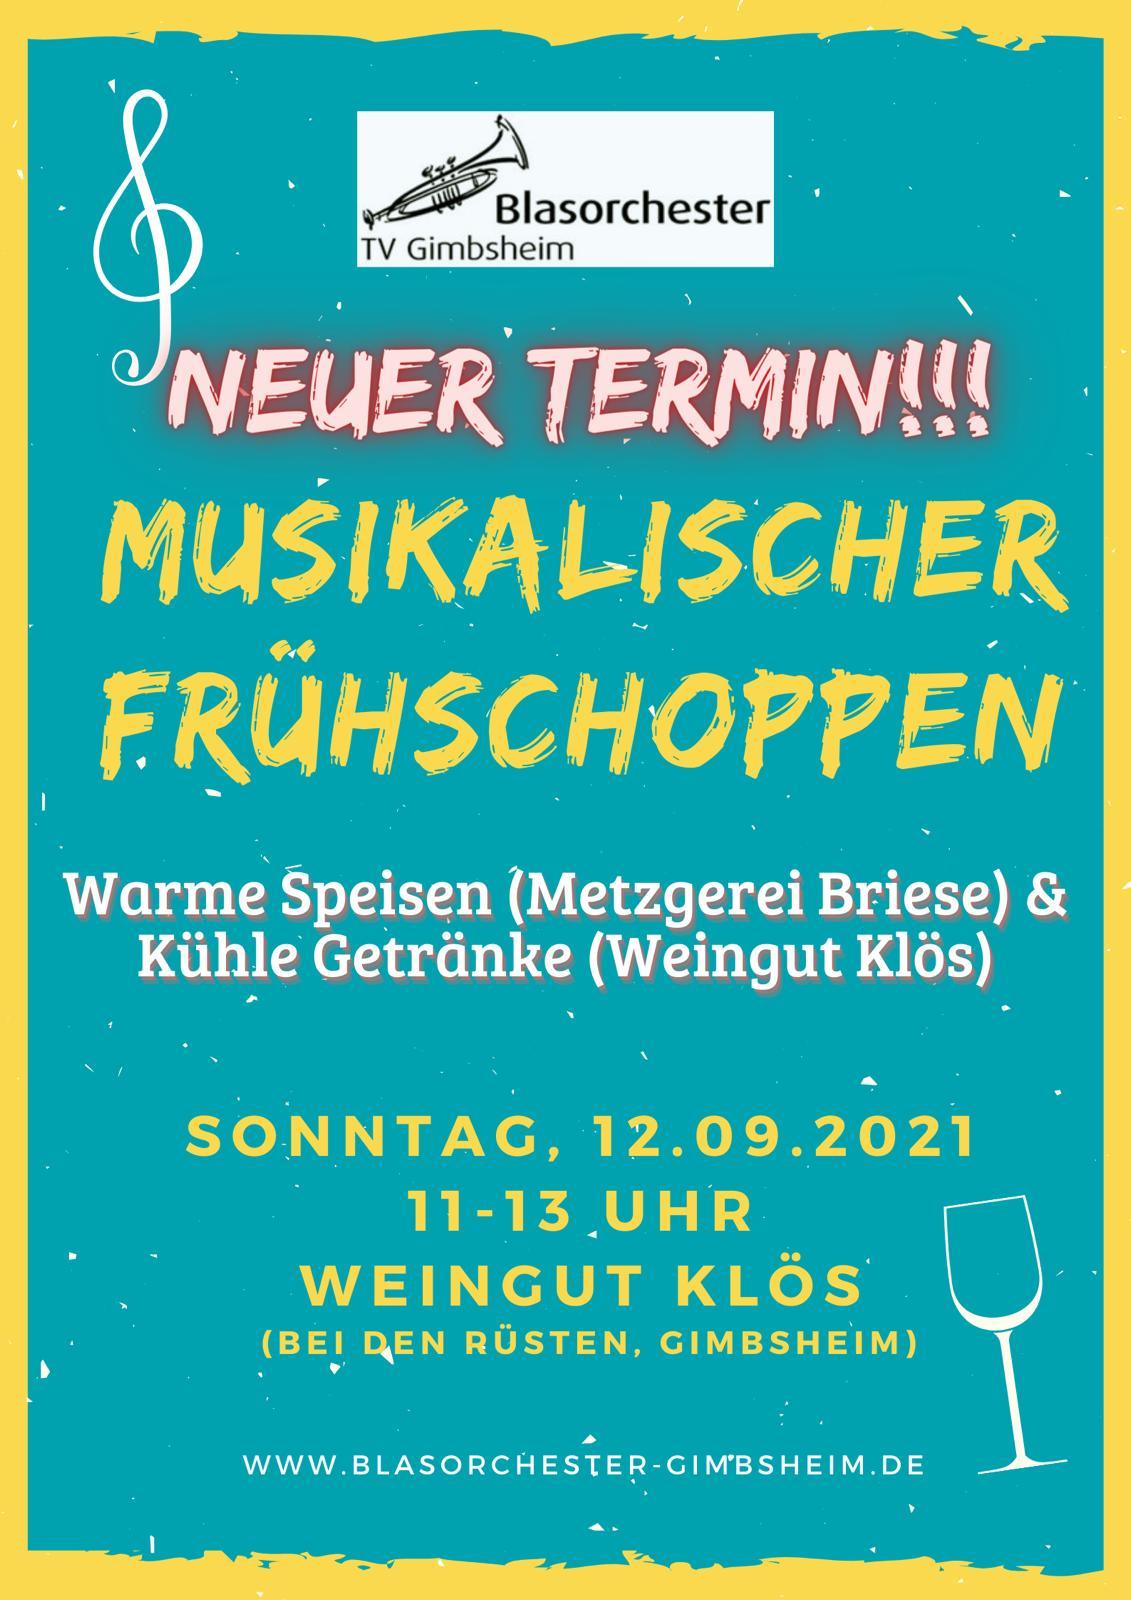 Musikalischer Frühschoppen – Neuer Termin!